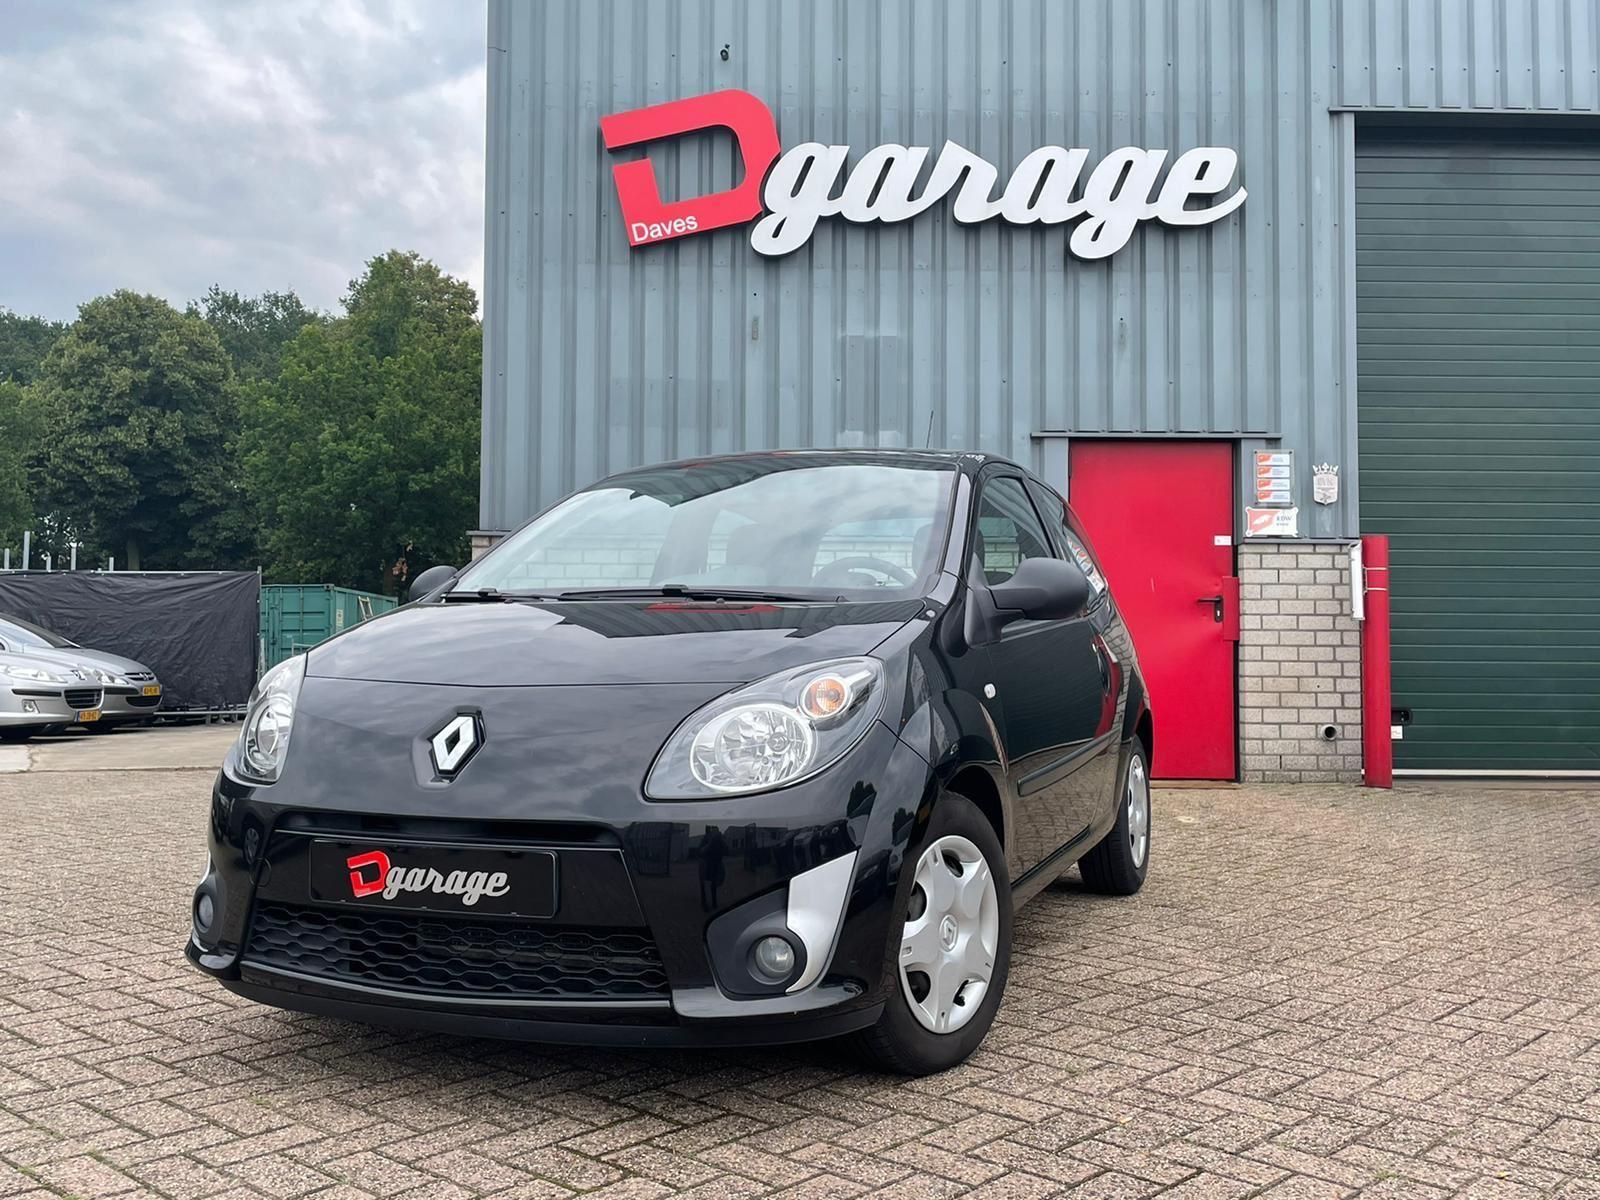 Renault Twingo occasion - Dave's Garage